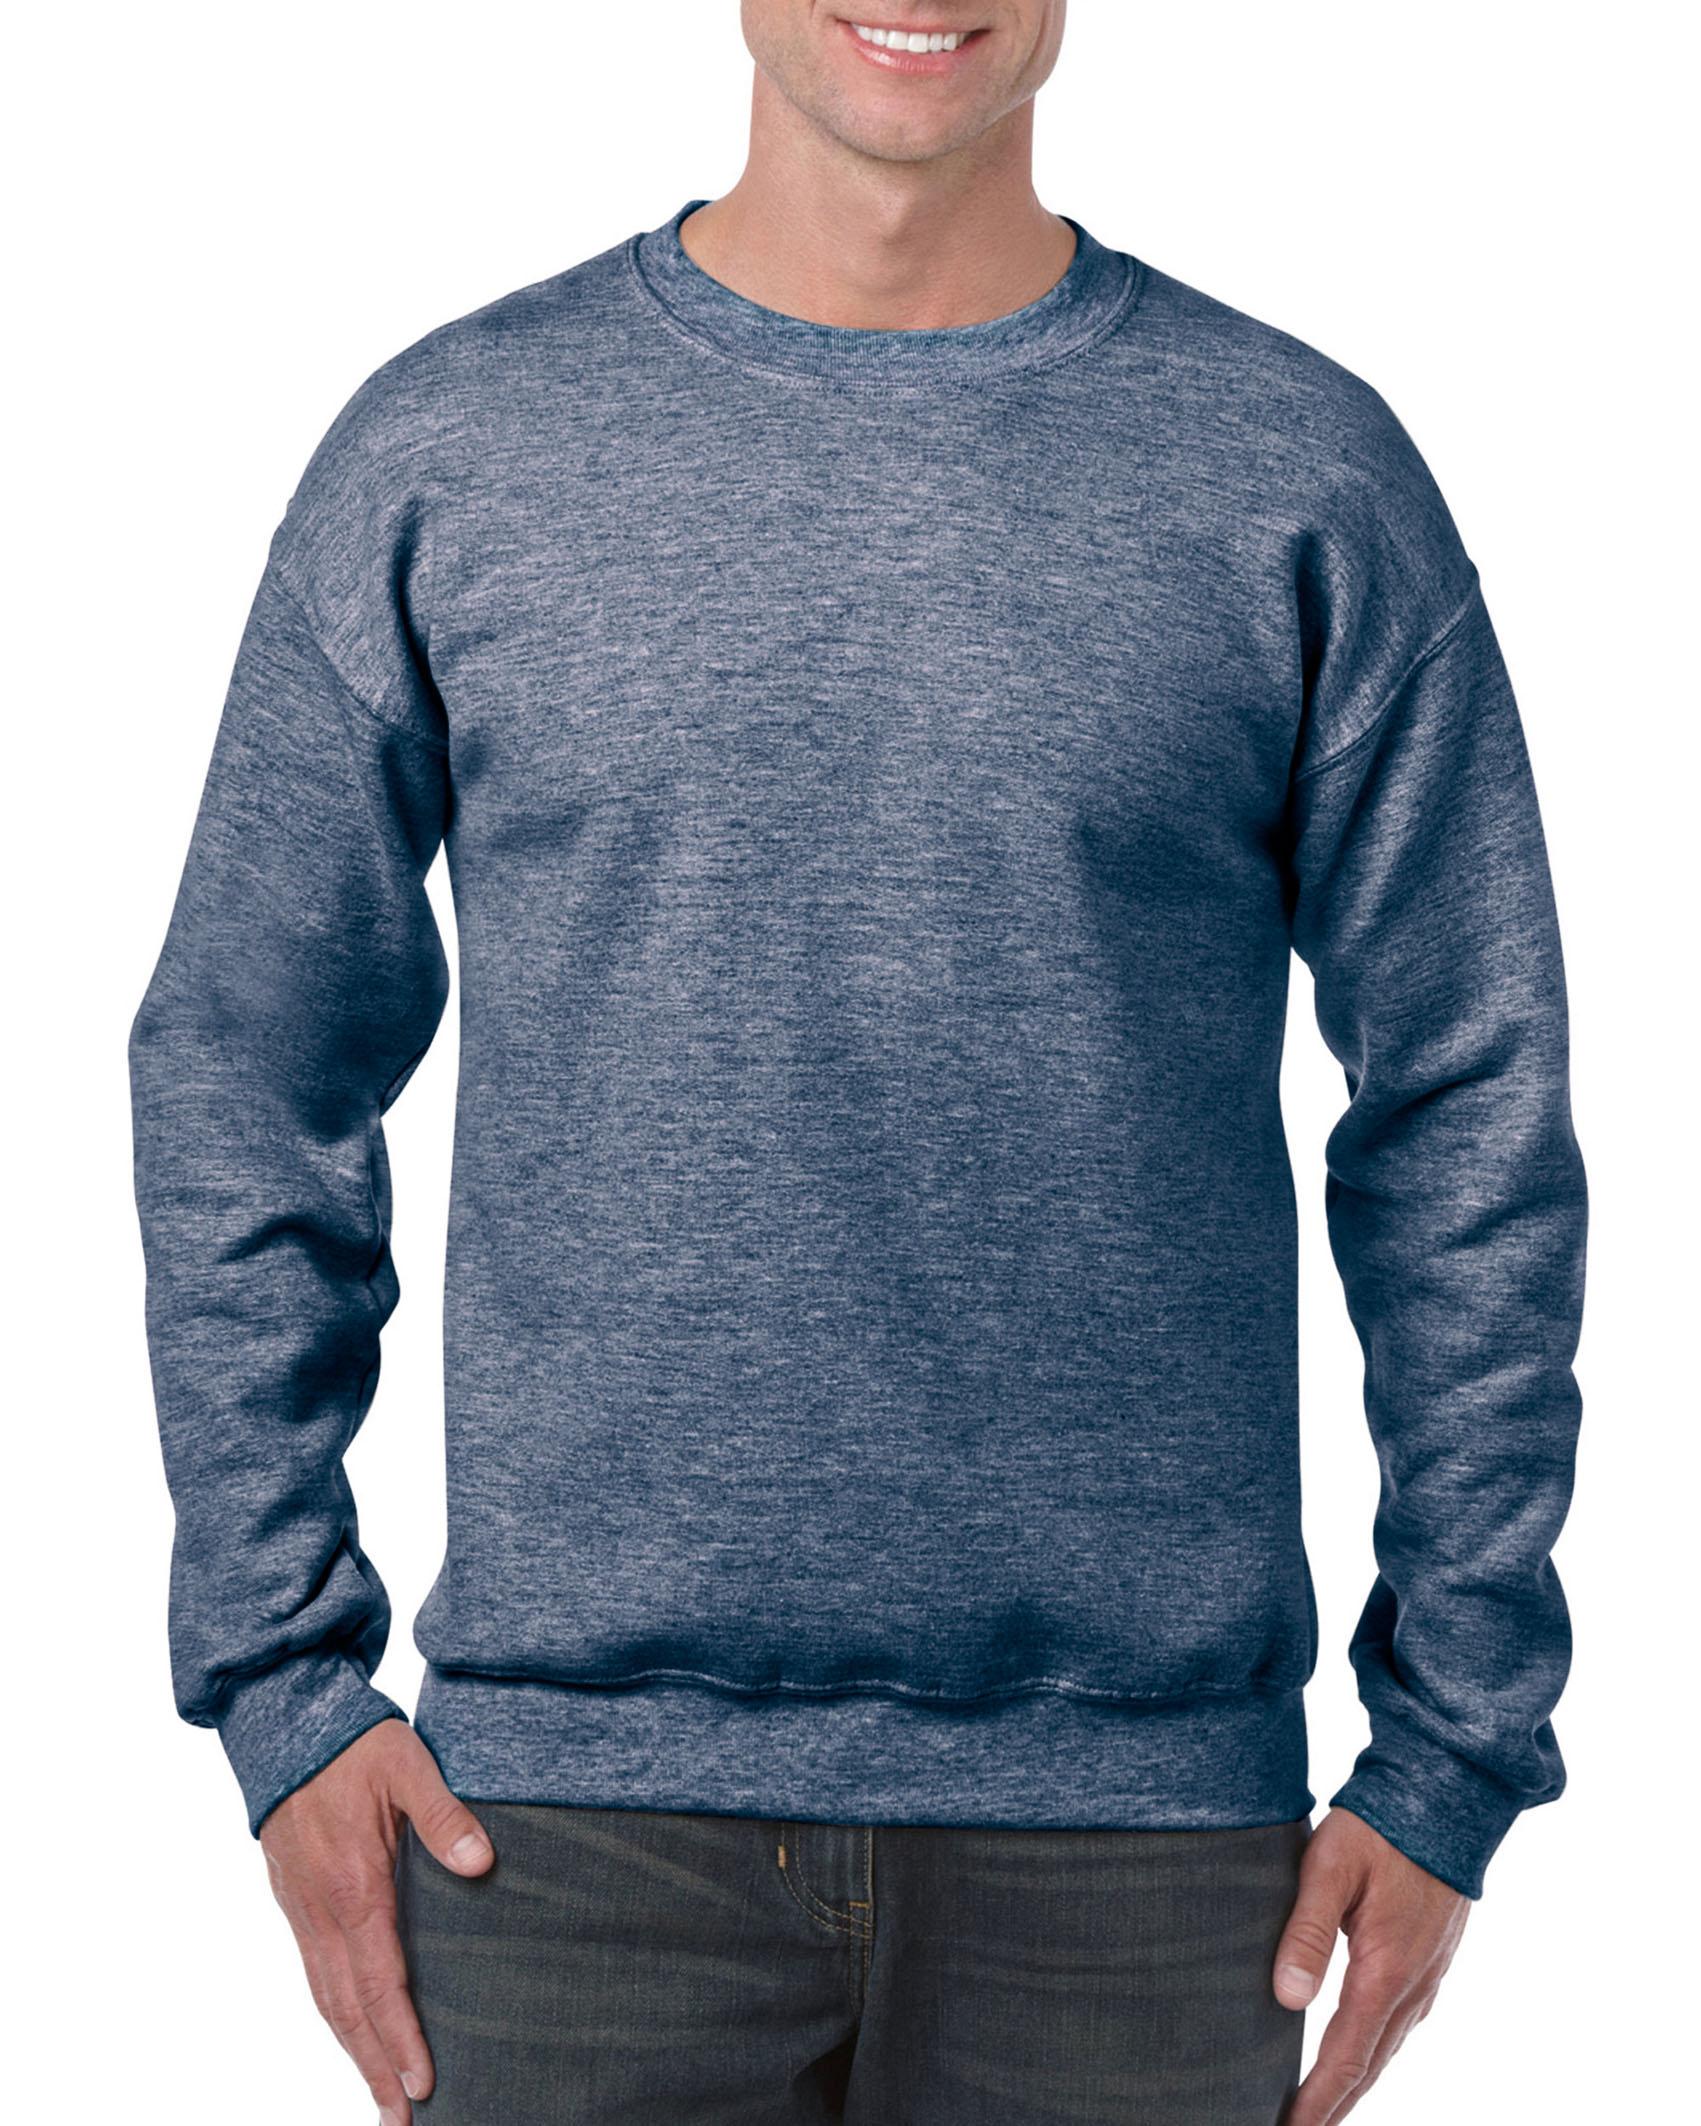 25St Gildan Sweater incl. 1k opdruk (Heather Navy)